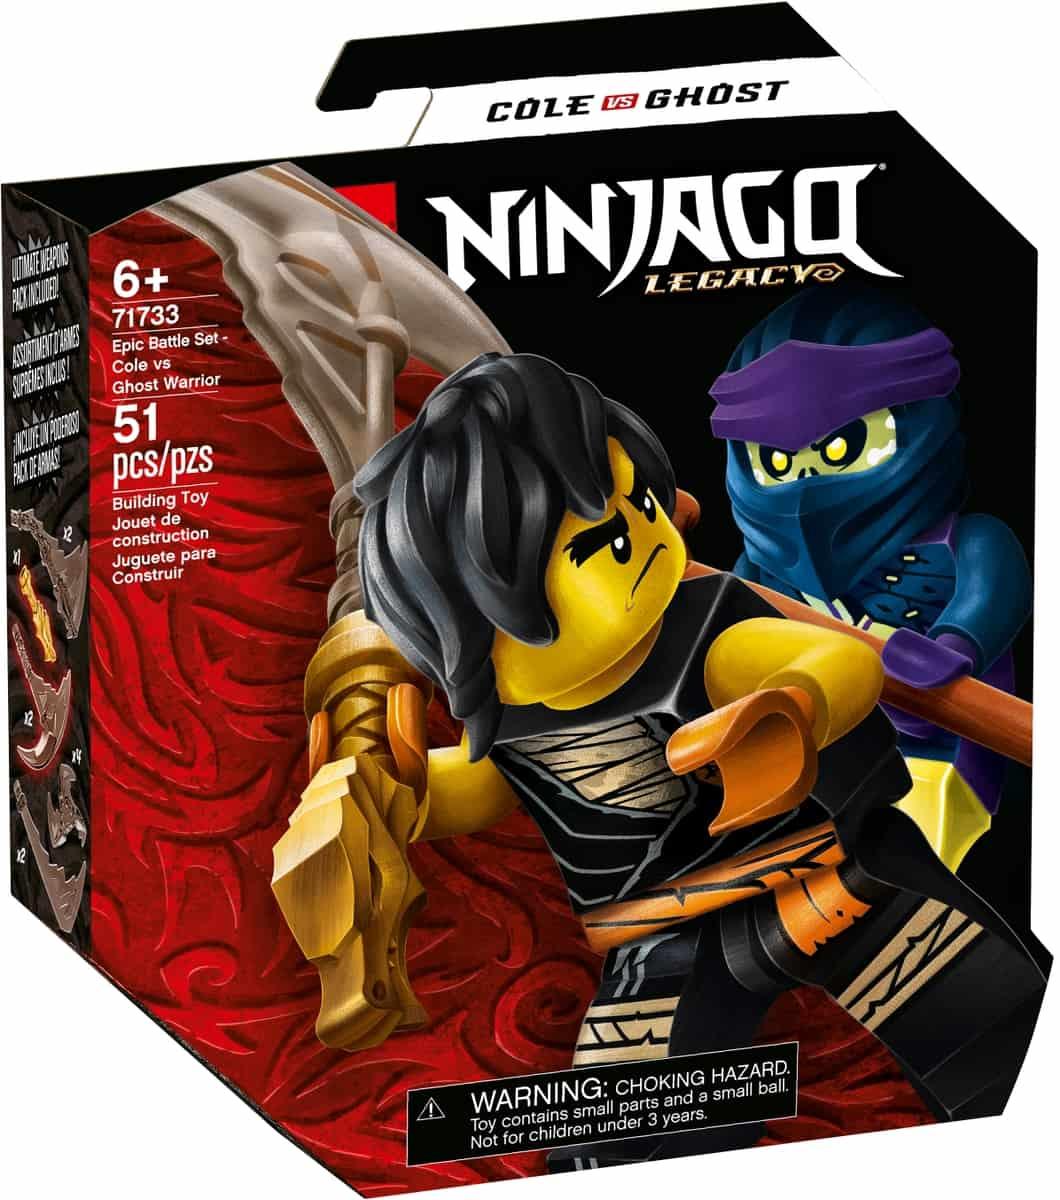 lego 71733 epic battle set cole vs ghost warrior